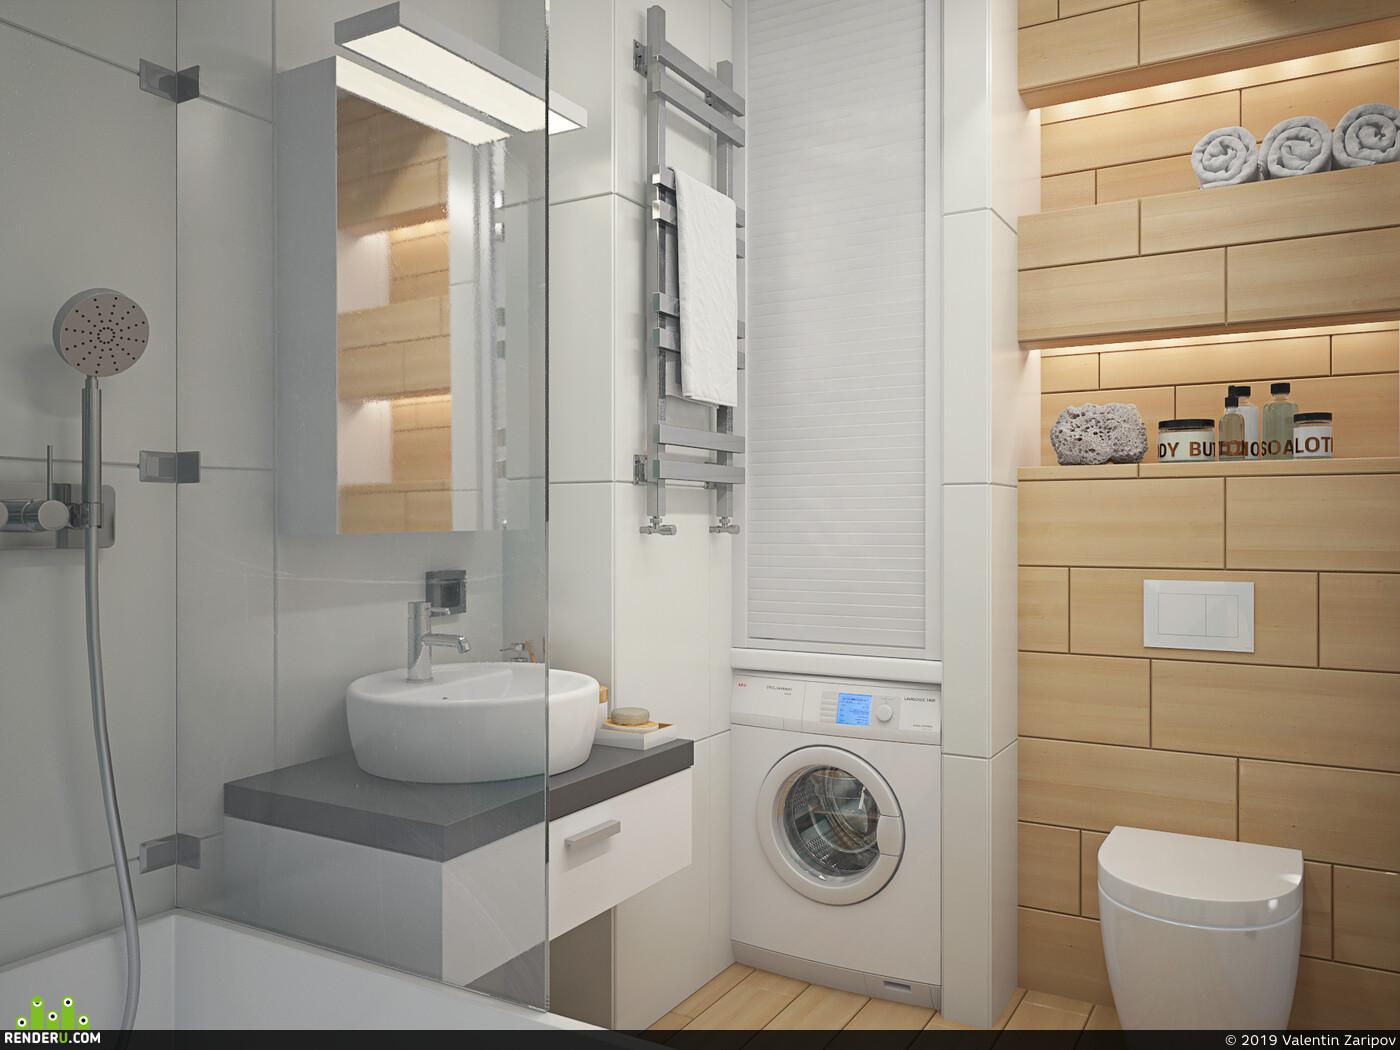 3д макс, вирей, Визуализация, интерьер, визуализация интерьера, дизайн, Дизайн Проект, дизайн интерьера, Туалет, визуализация ванной